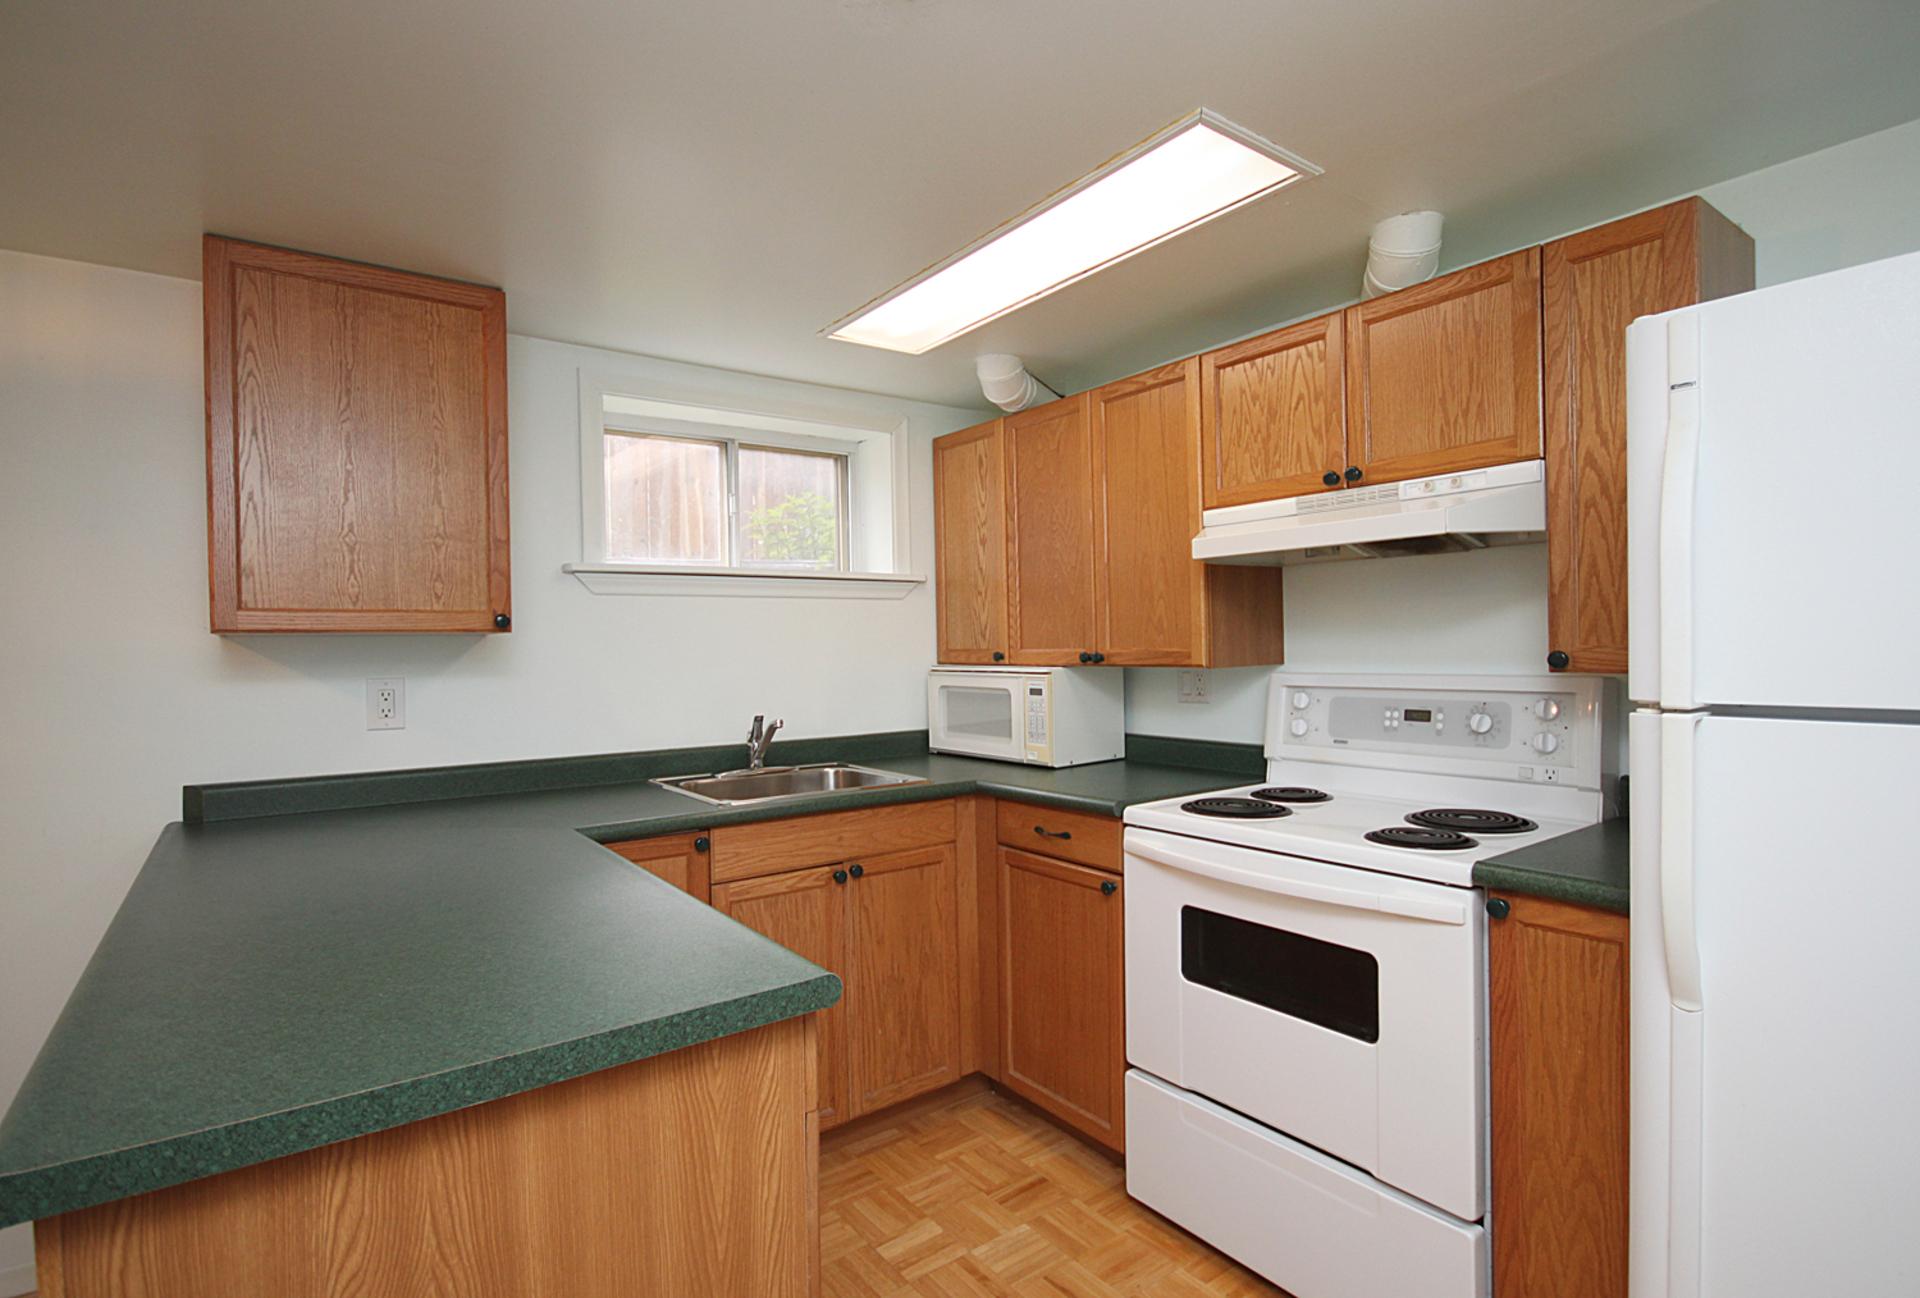 Kitchen at 31 Groveland Crescent, Parkwoods-Donalda, Toronto